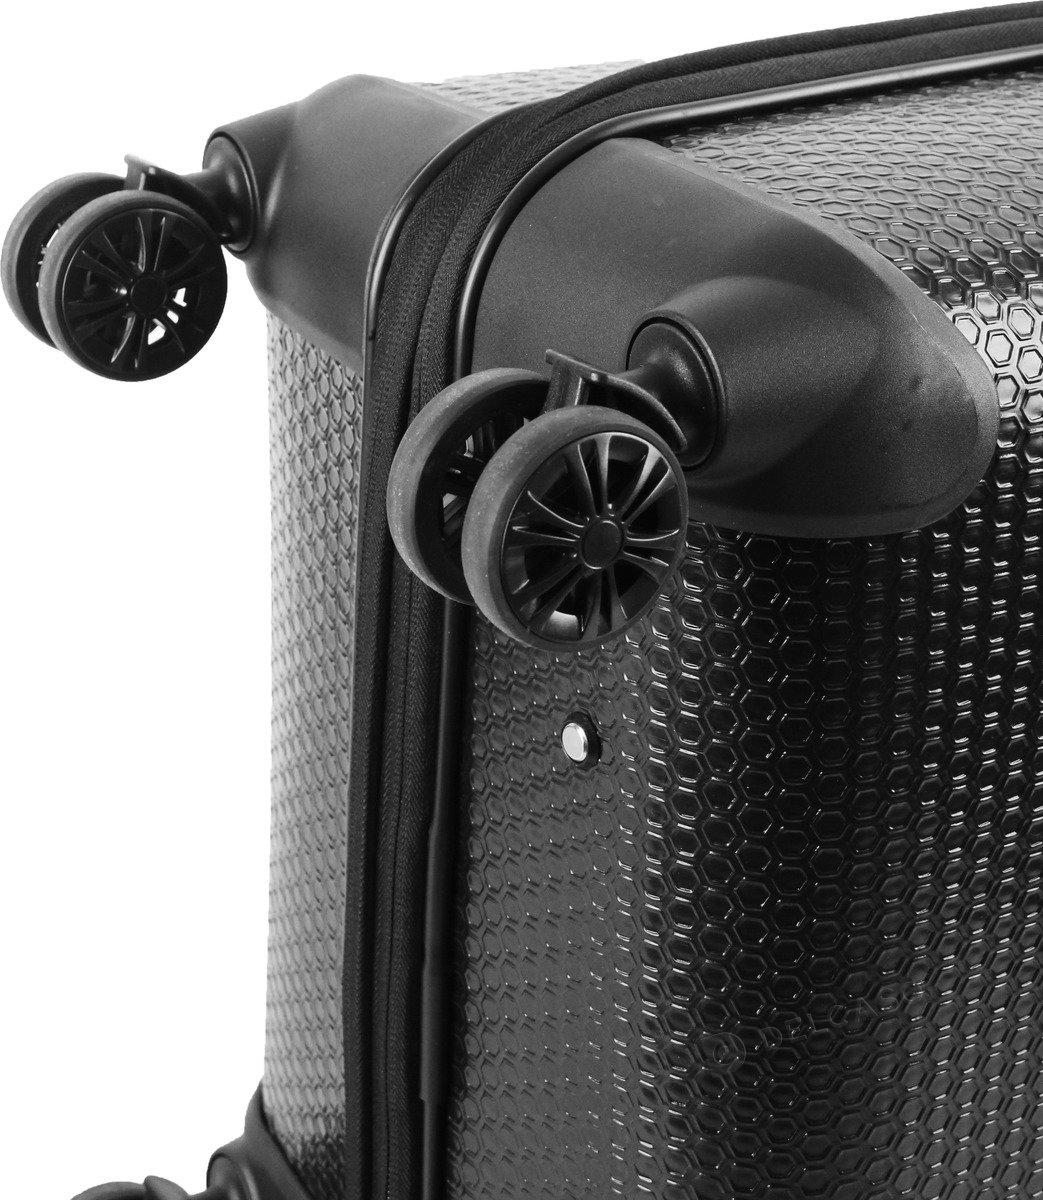 Walizka średnia Cat Caterpillar Hexagon 66 cm czarna